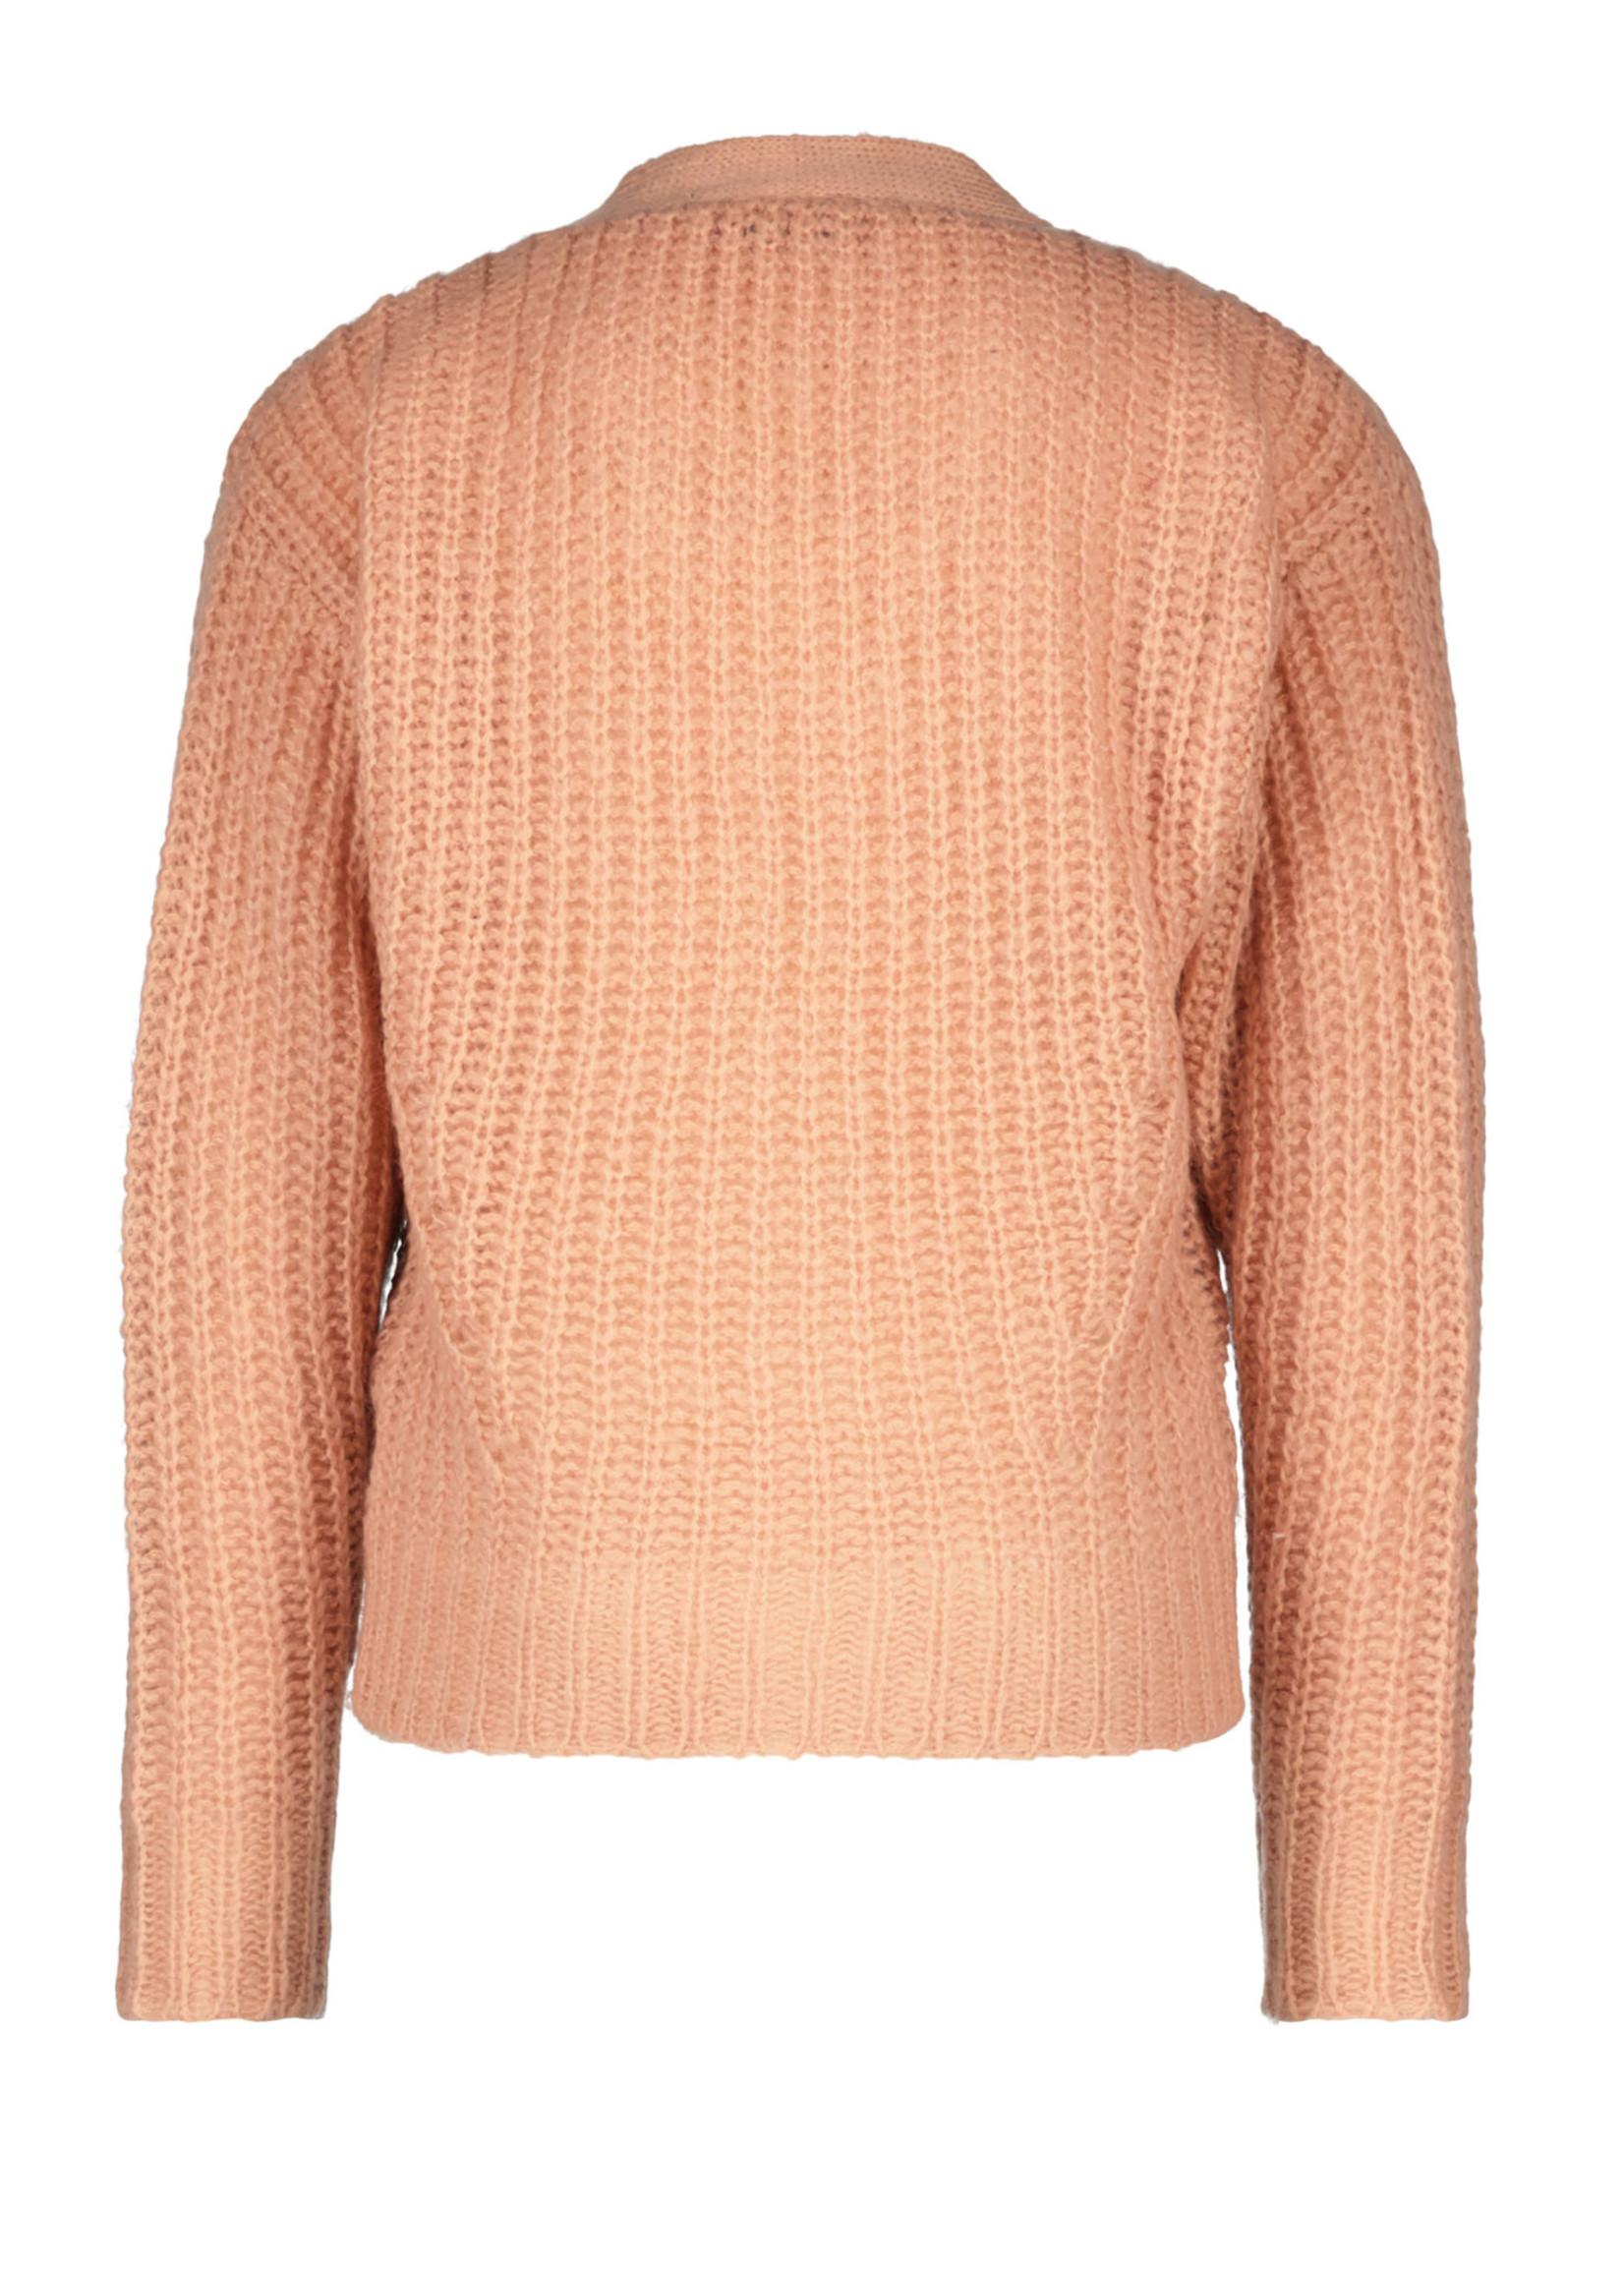 LIKE FLO LIKE FLO Cardigan knit powder pink